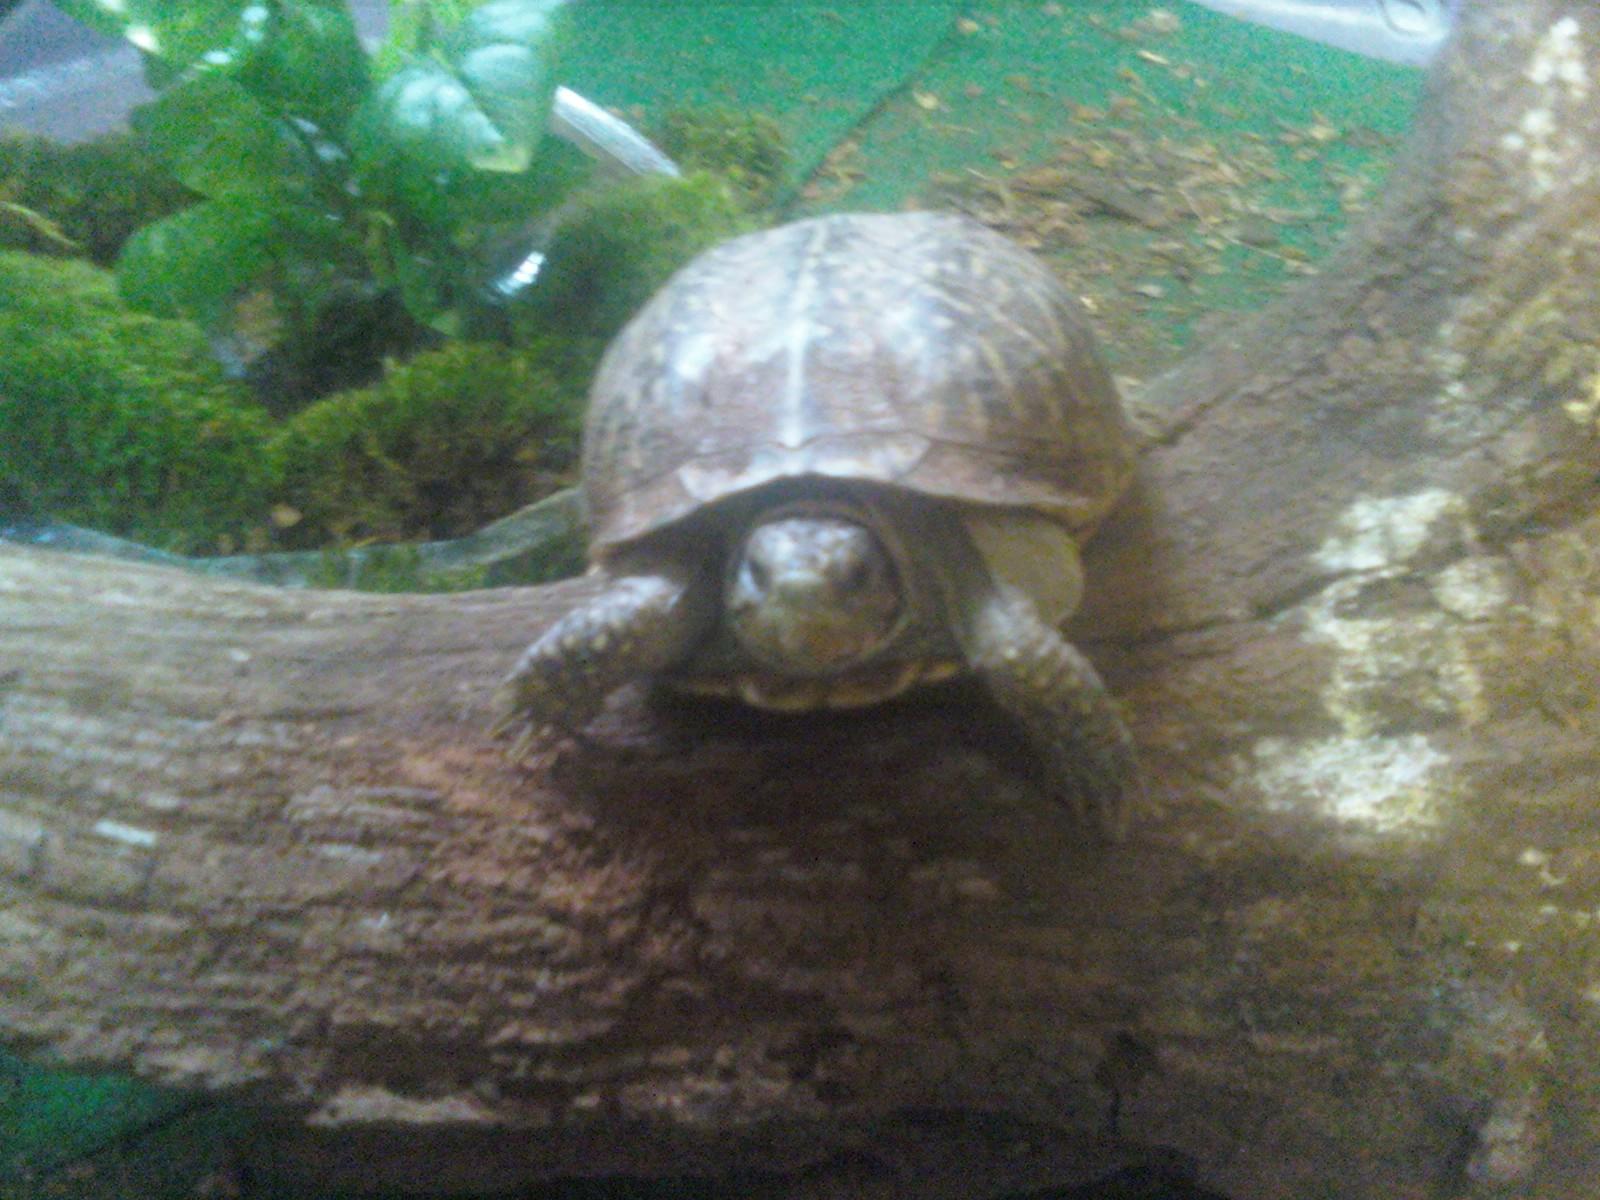 Baby Box Turtles Habitat Eastern box turtles are